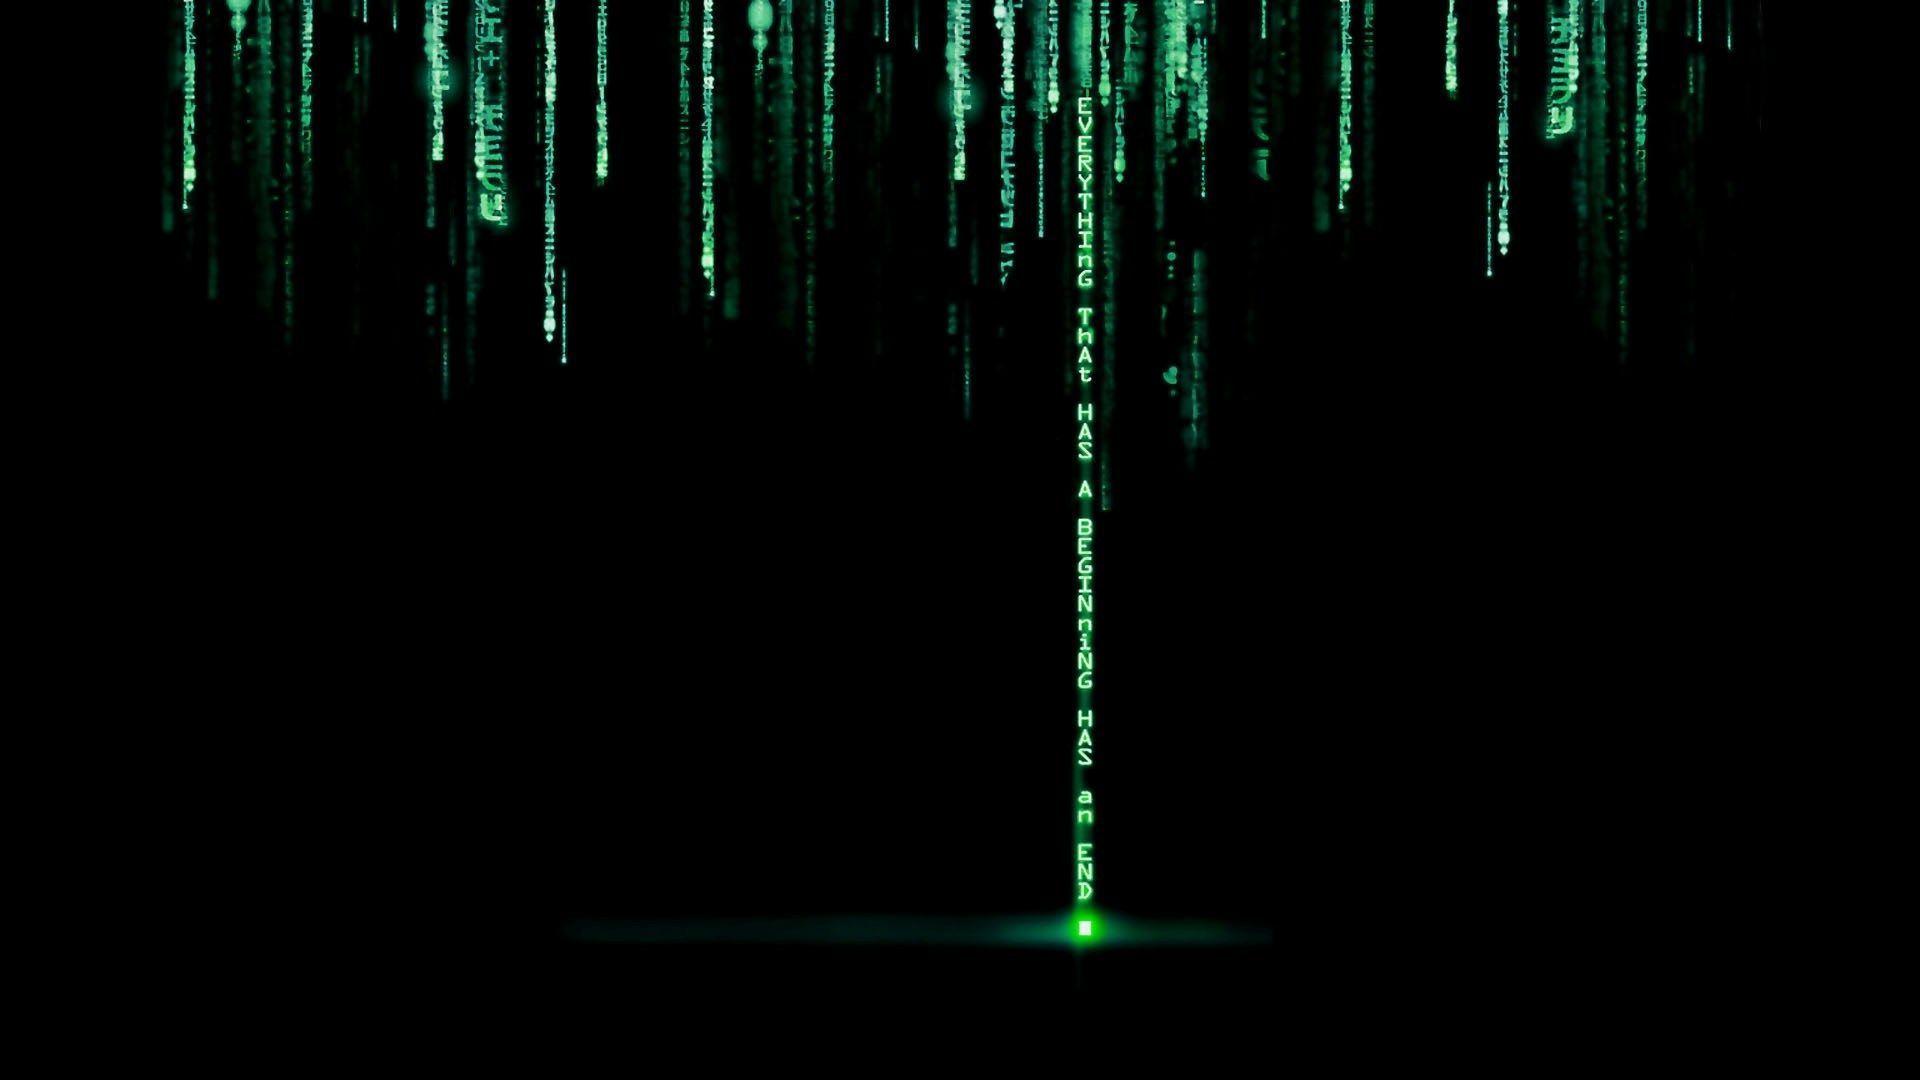 Matrix Free Background Wallpaper 4k 4k In 2020 Code Wallpaper Hd Wallpaper Wallpaper Windows 10